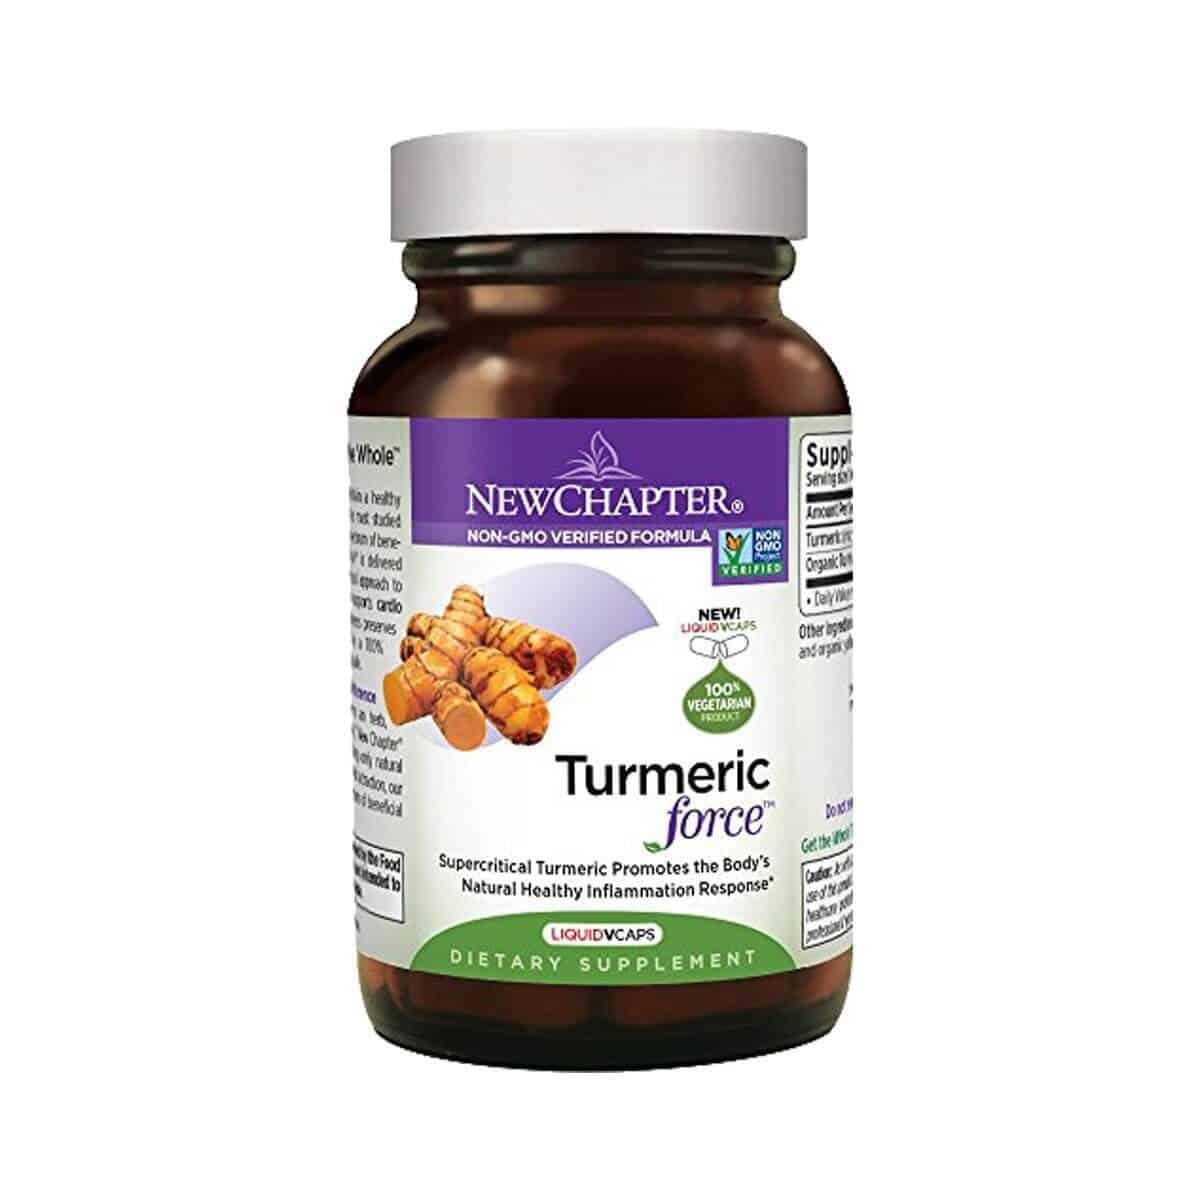 Turmeric Force Supplement